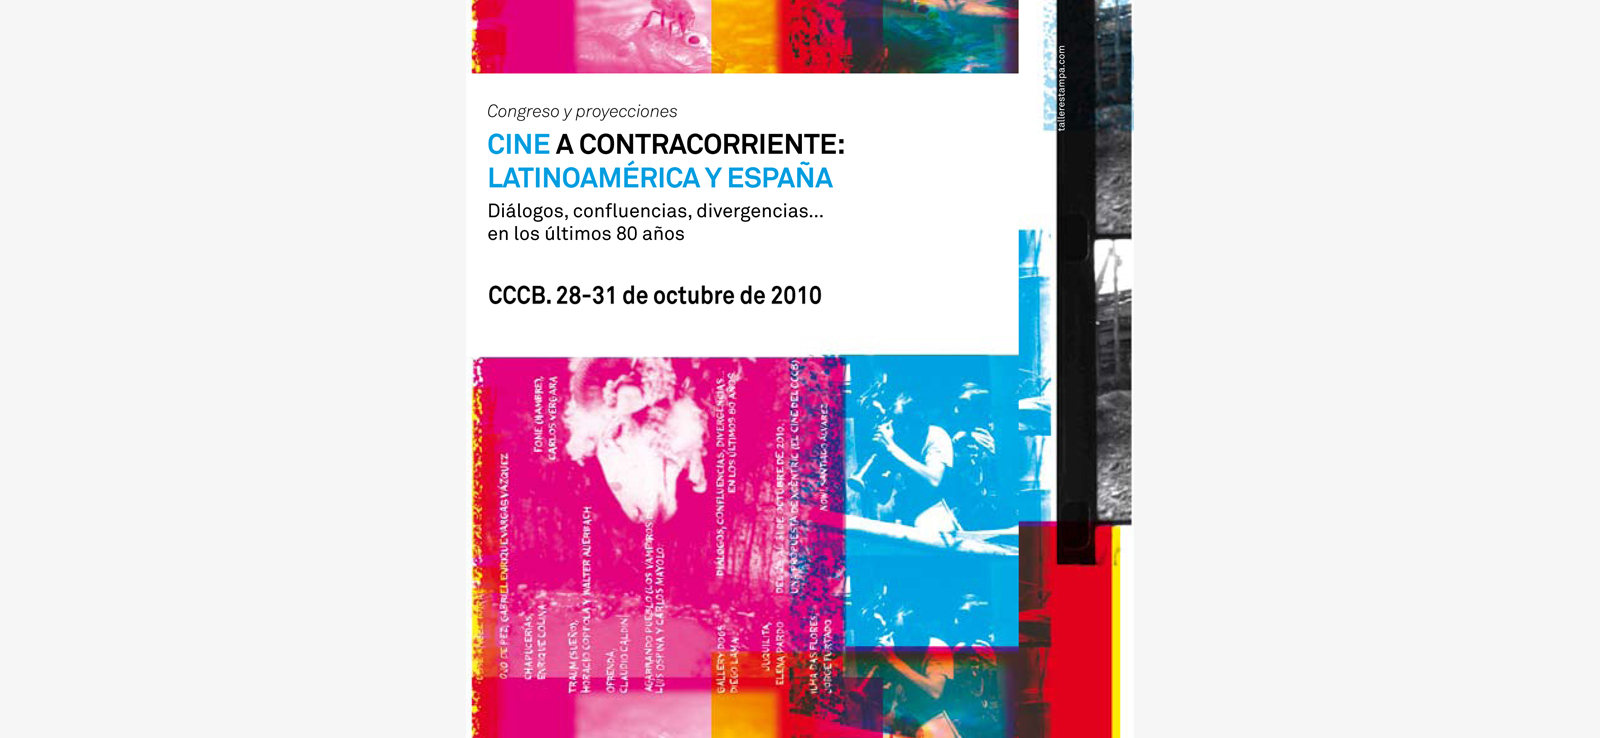 Antoni-Pinent-curator-CINEMA-AGAINST-THE-TIDE